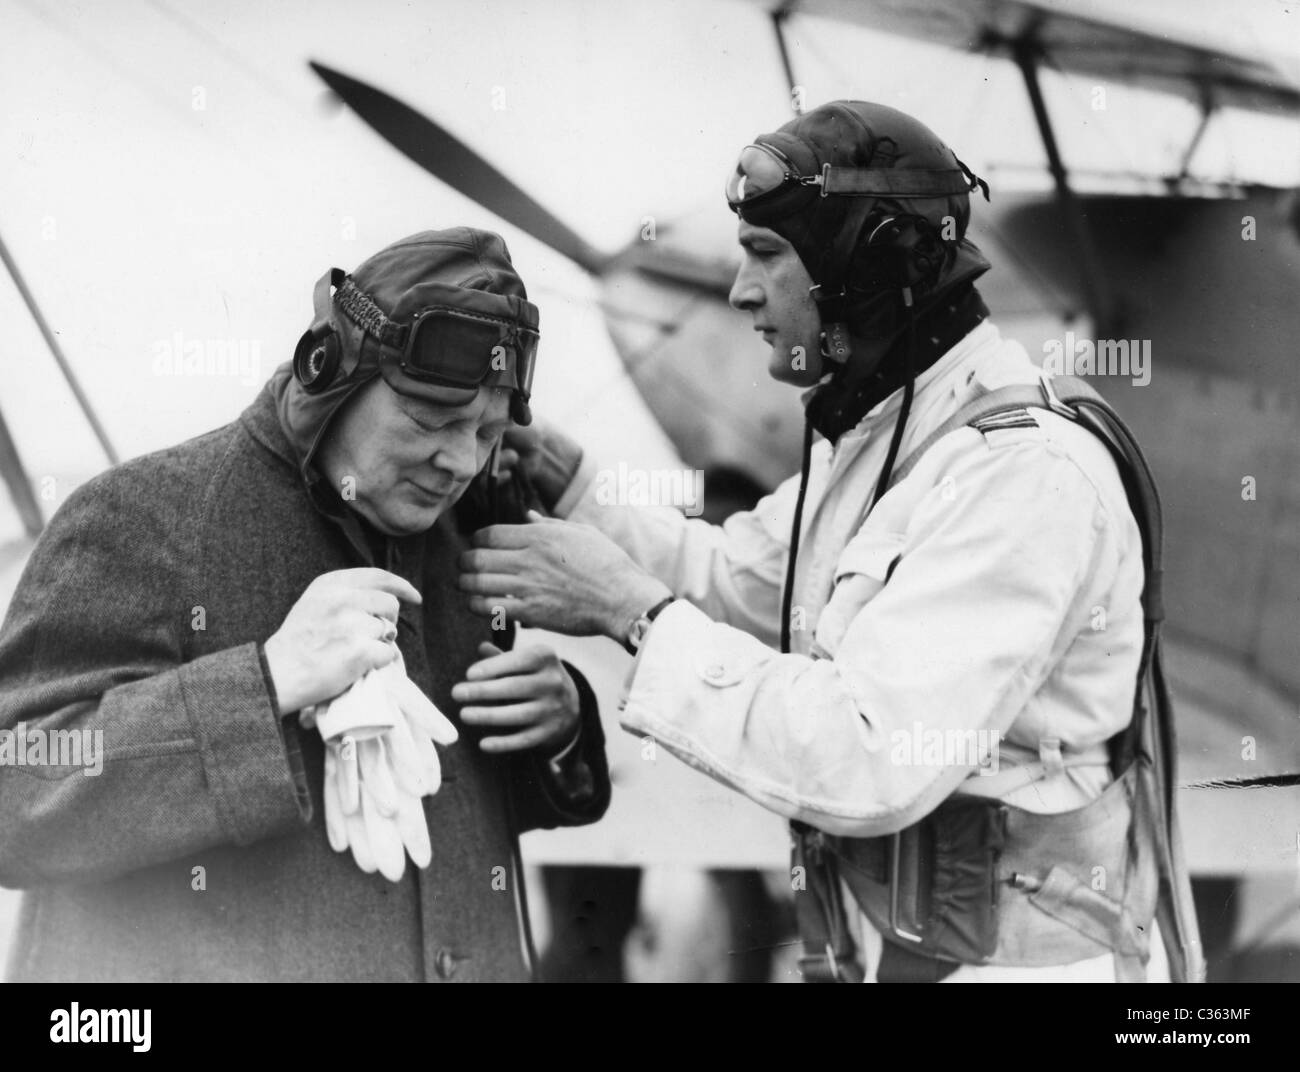 Sir Winston Churchill as an air commodore - Stock Image